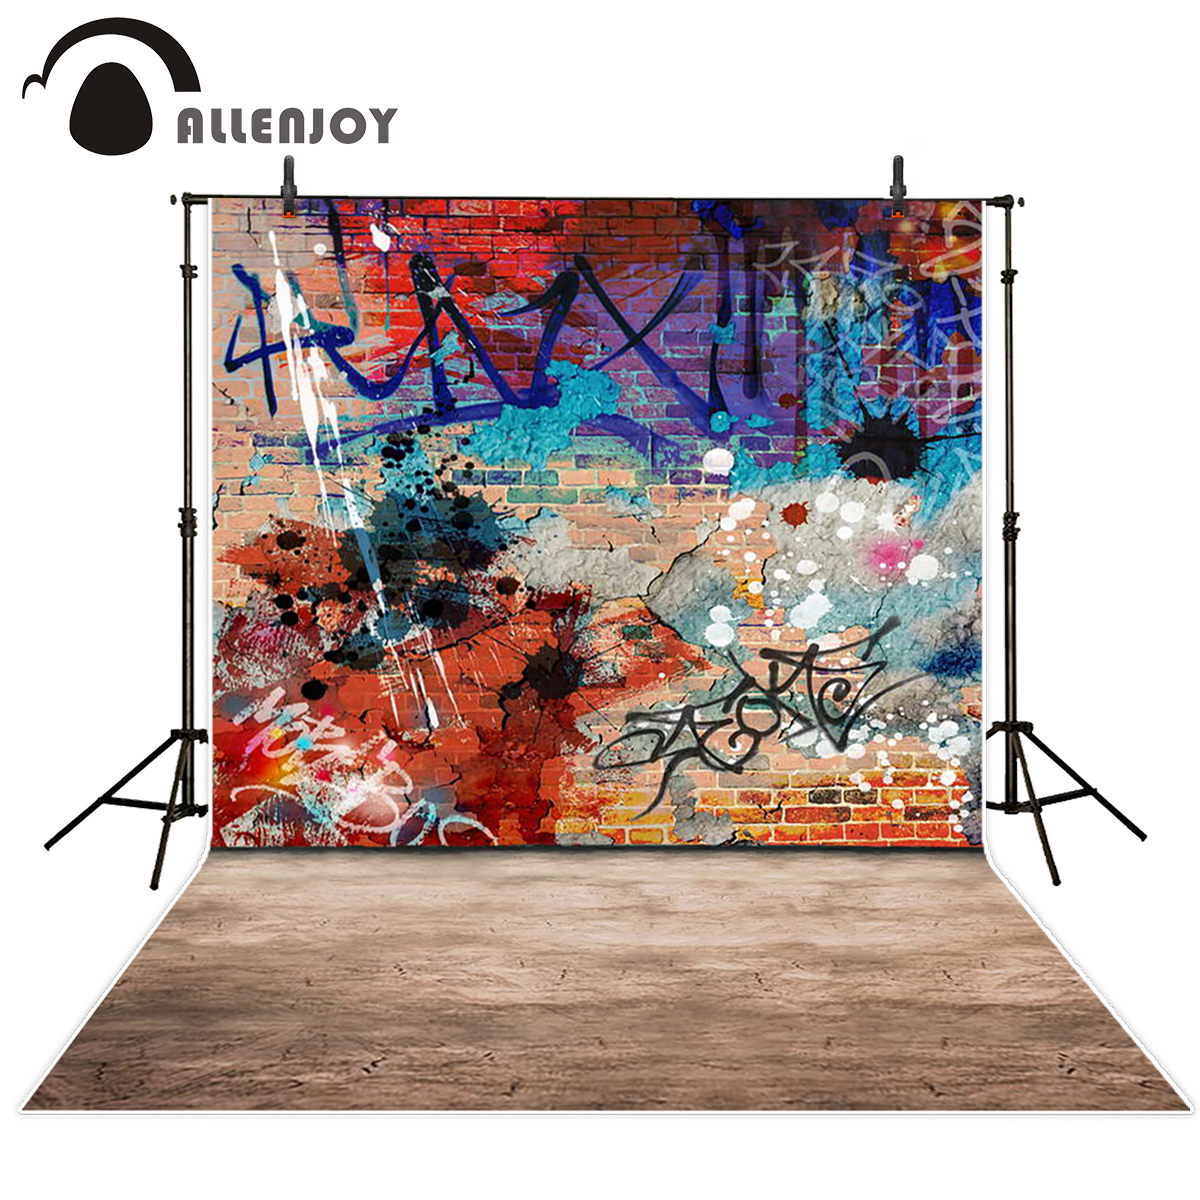 Allenjoy background studio graffiti wall street backdrop photography backgrounds fantasy backdrops excluding bracket